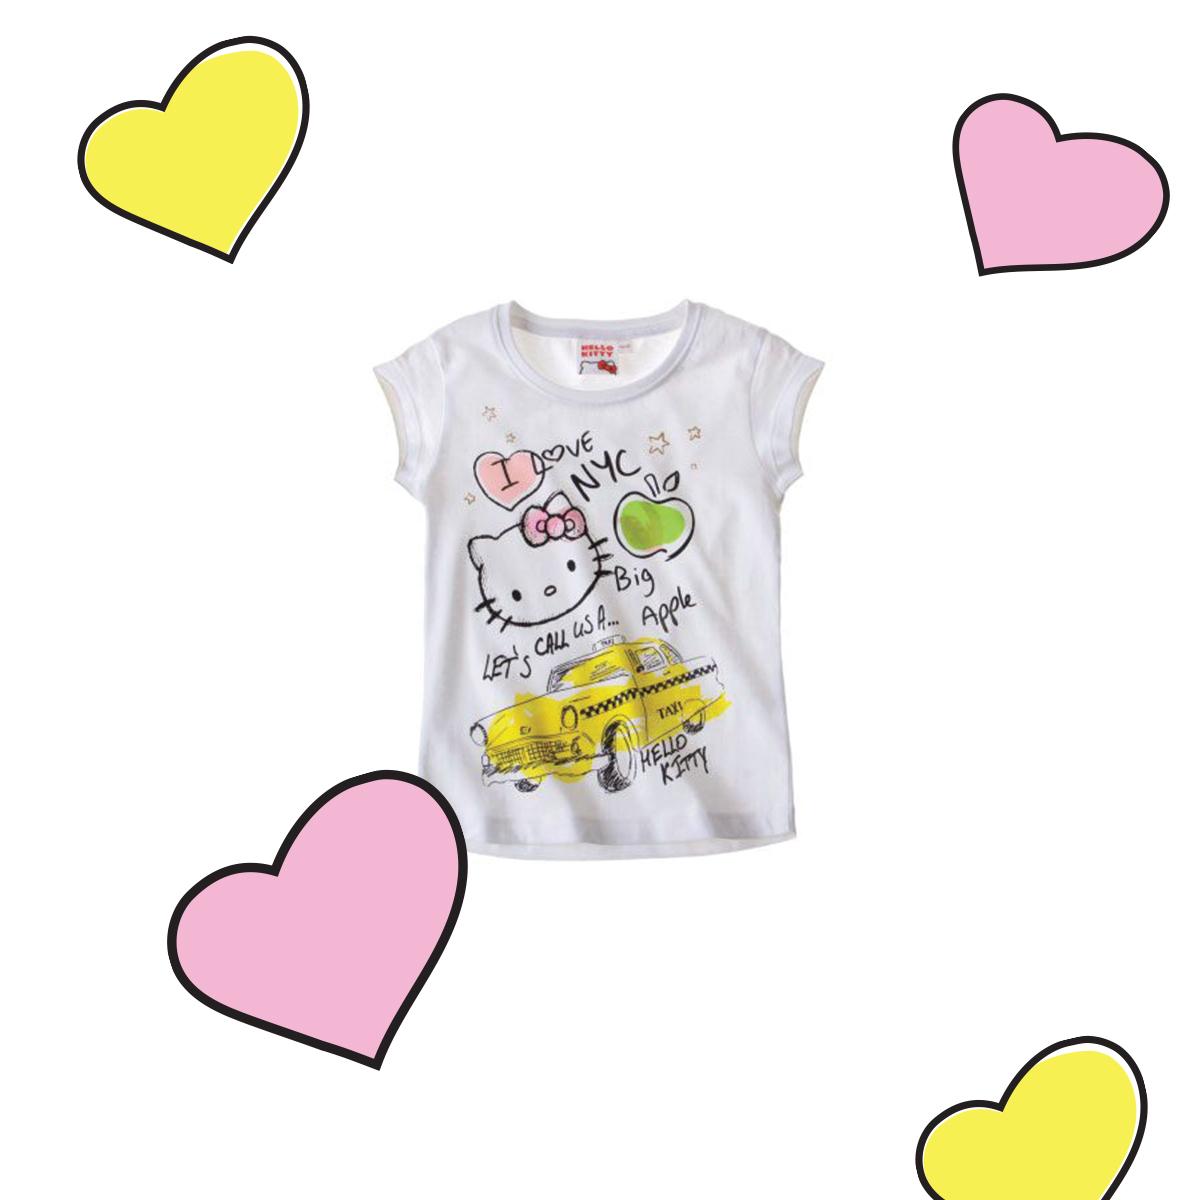 Design your own hello kitty t-shirt - Design Your Own Hello Kitty T-shirt 9